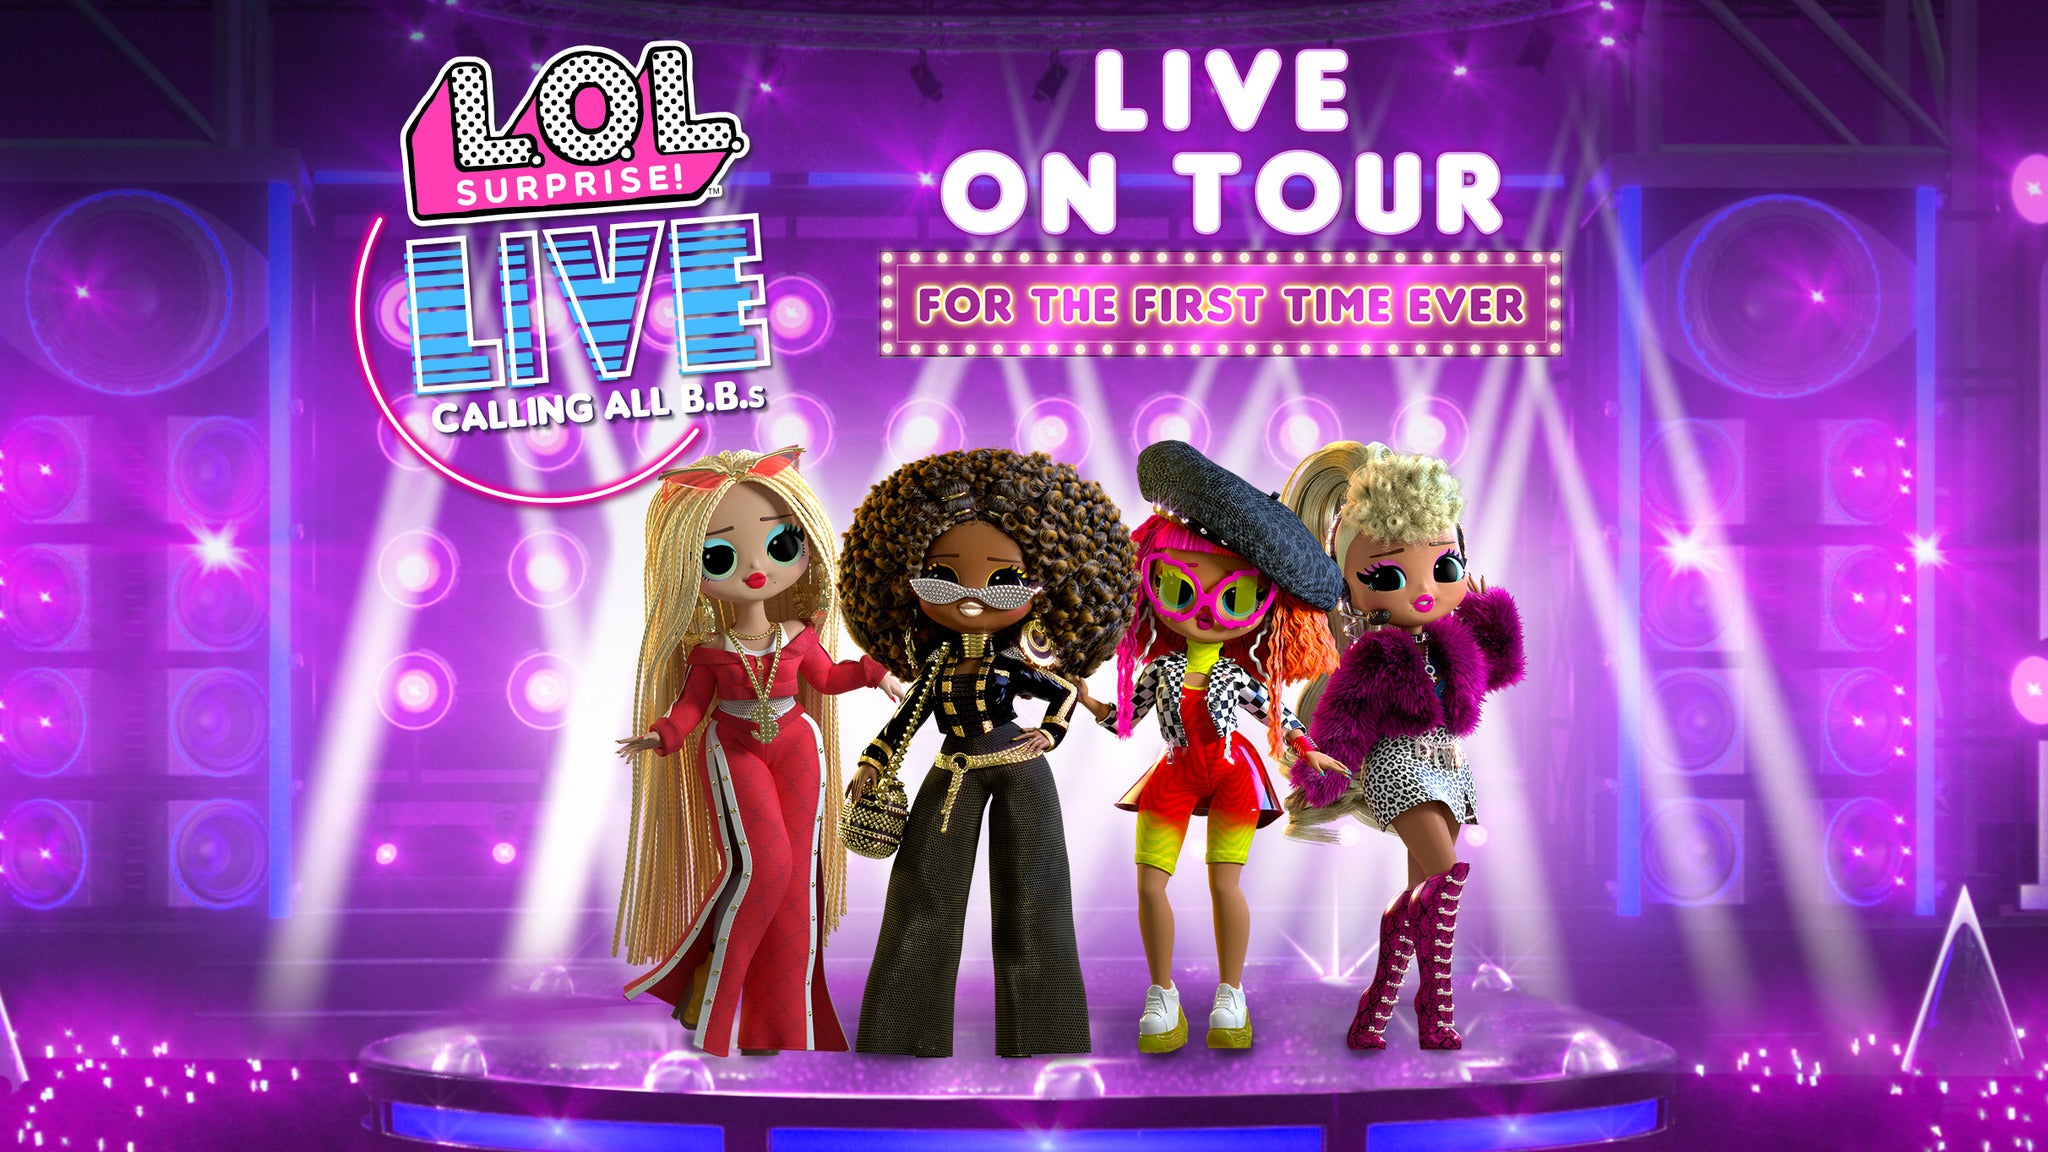 presale code for L.O.L. Surprise! Live tickets in Los Angeles - CA (Orpheum Theatre)